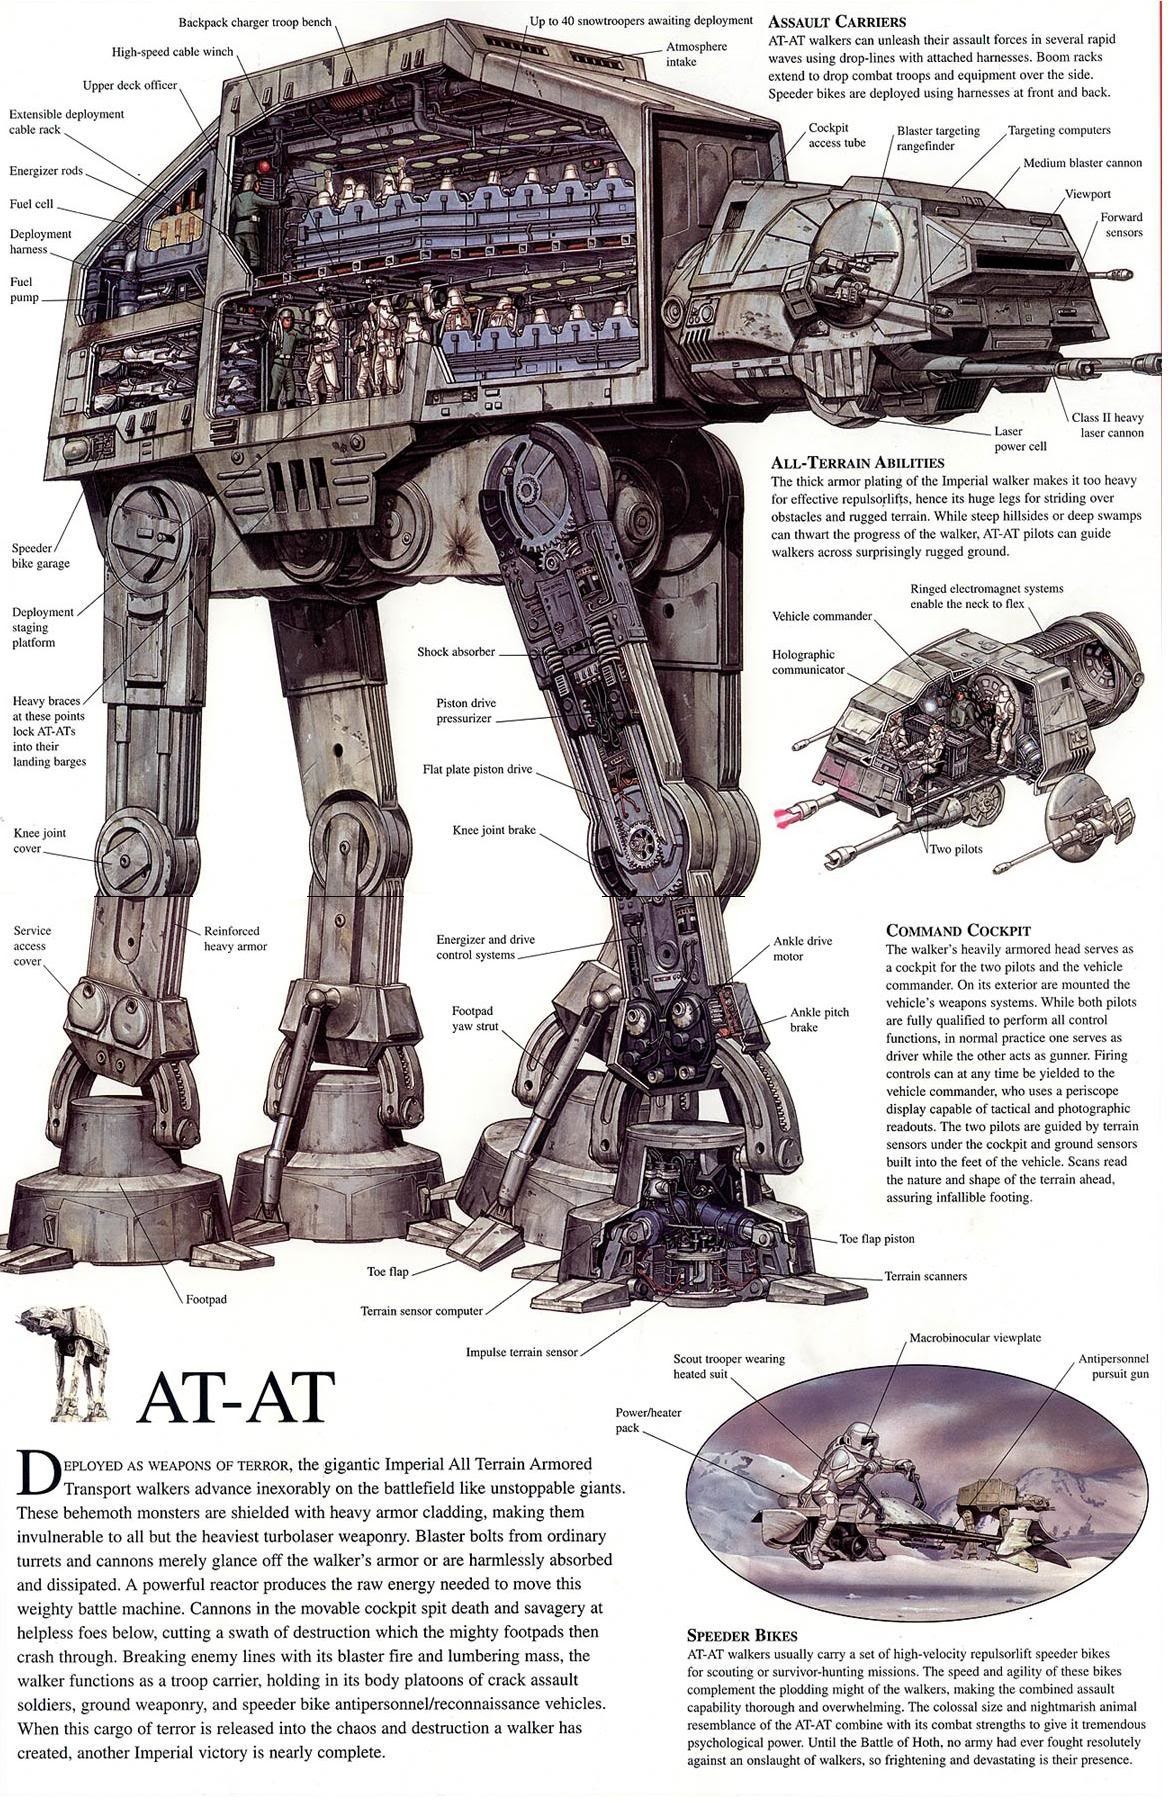 Star Wars: All Terrain Armored Transport